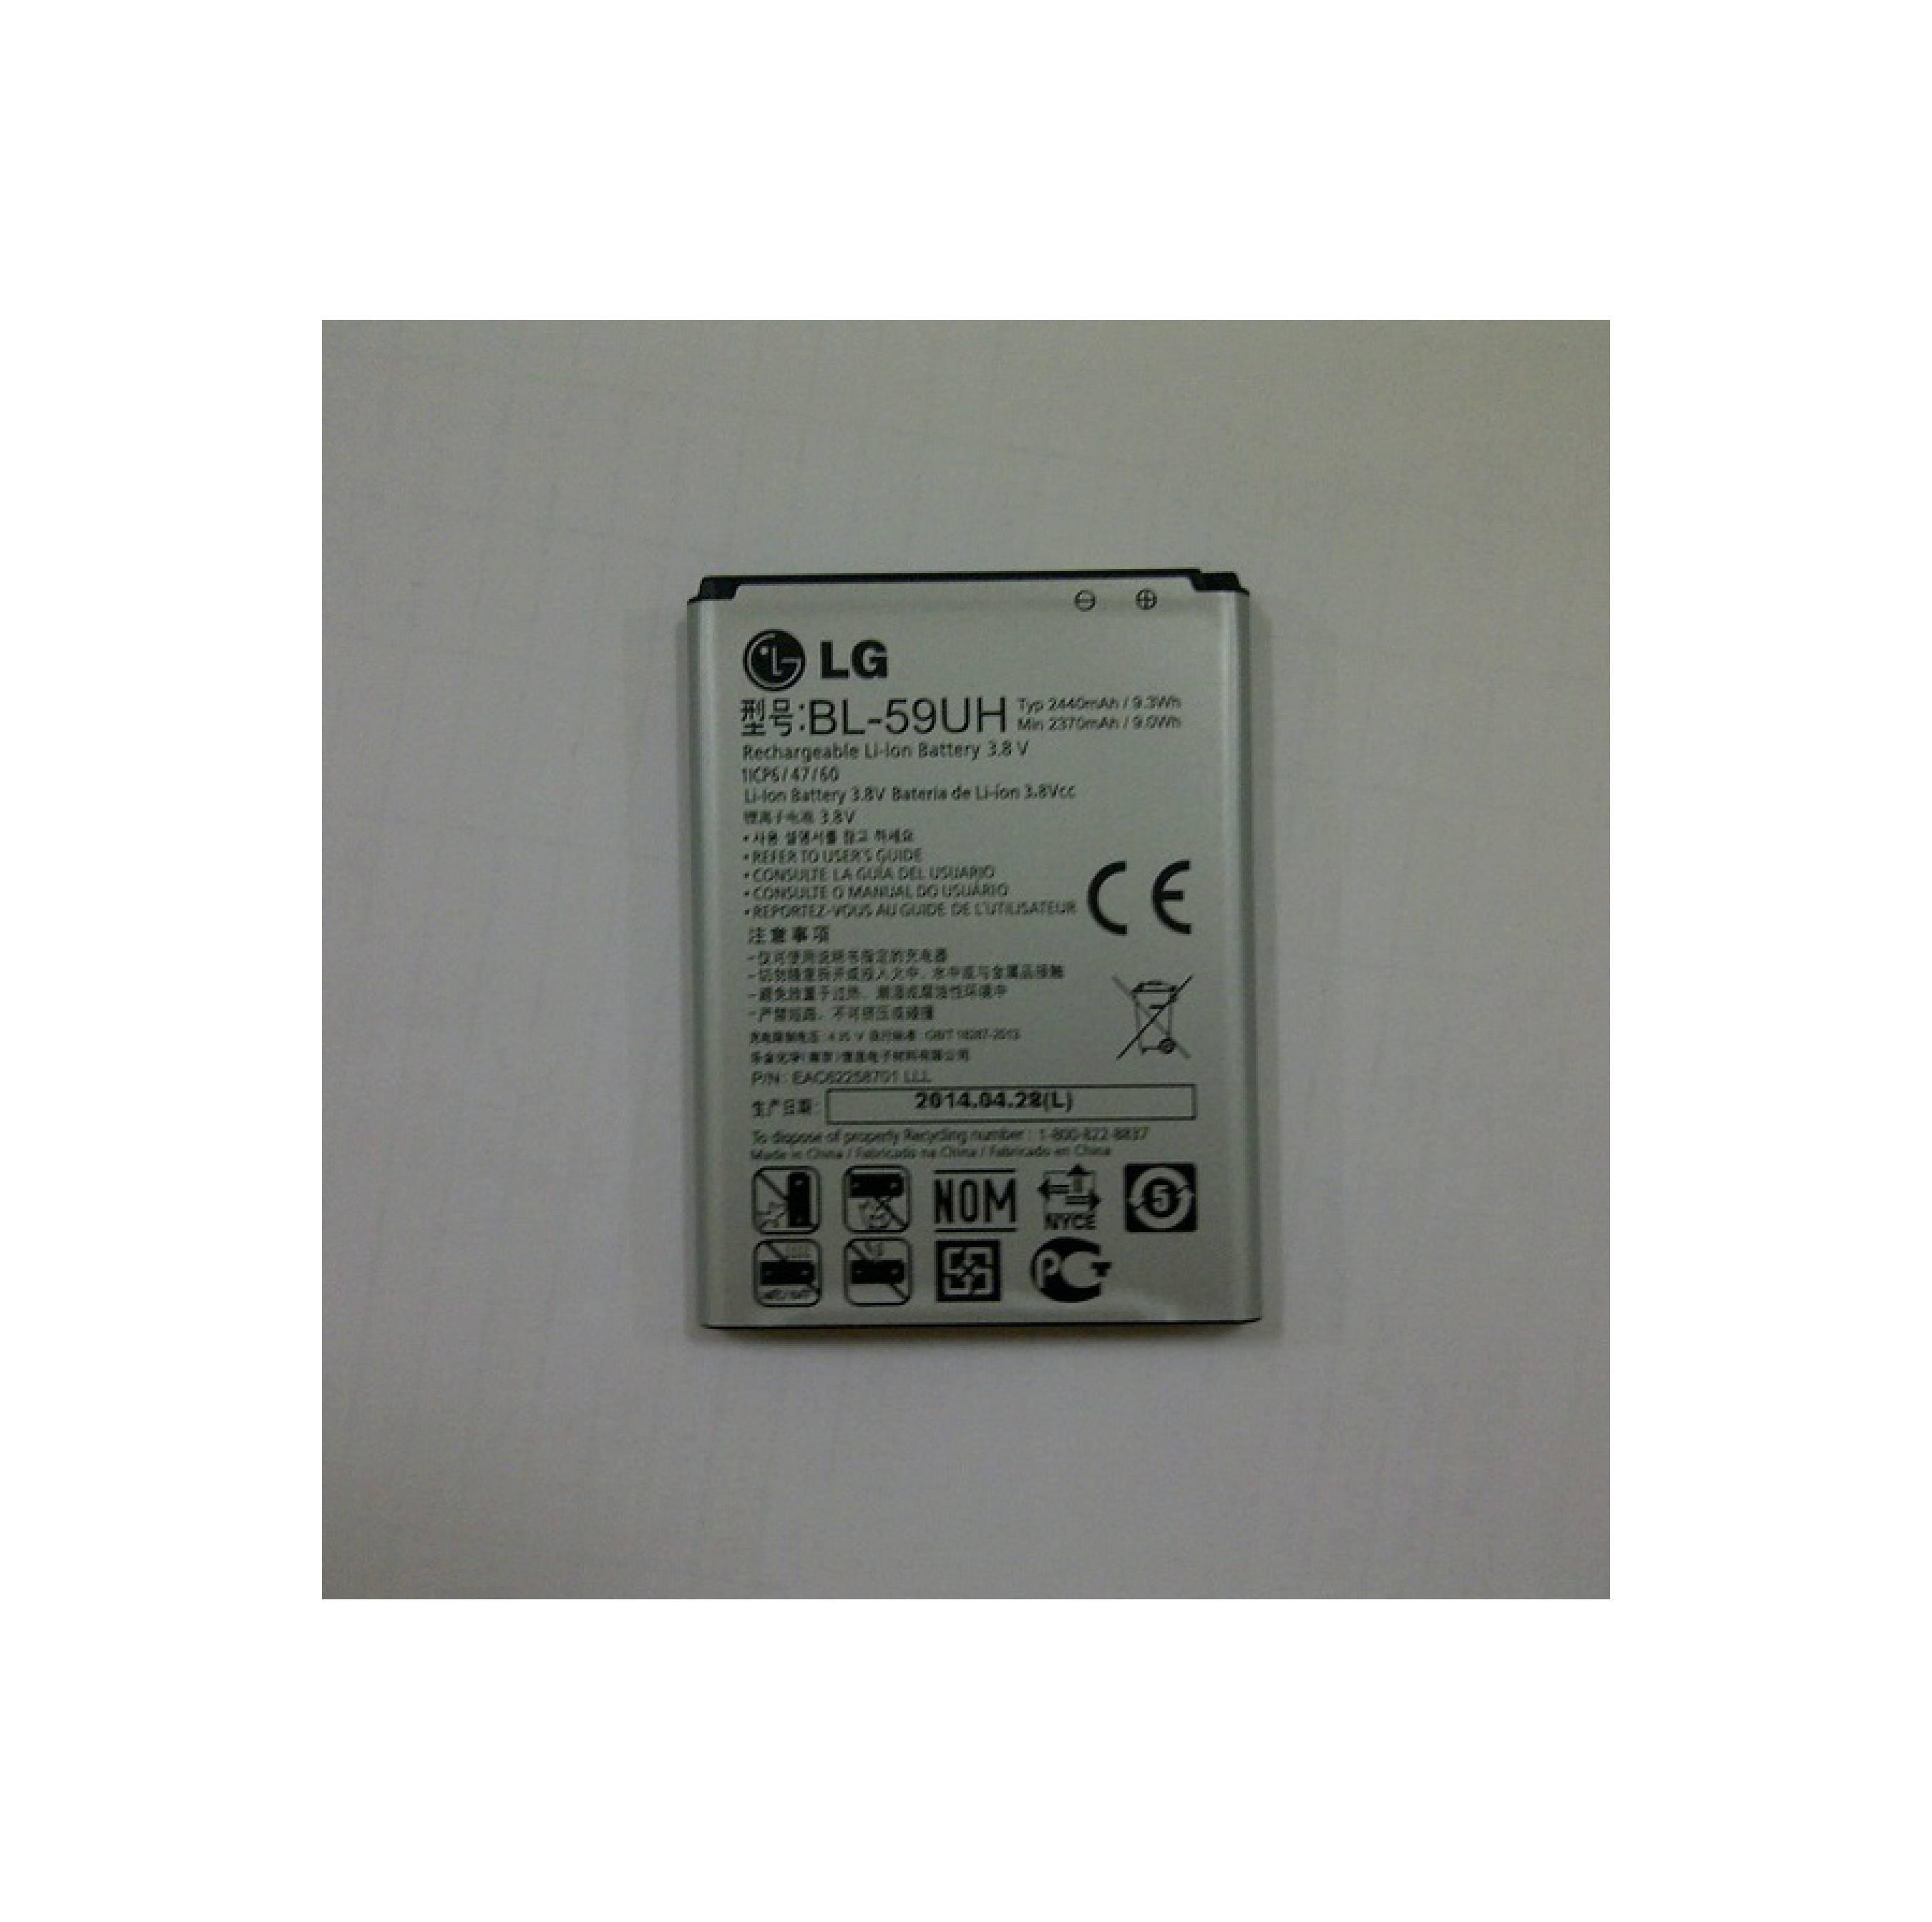 Baterai Battery LG G2 Mini, F70, VS876 Lucid 3 BL-59UH Original